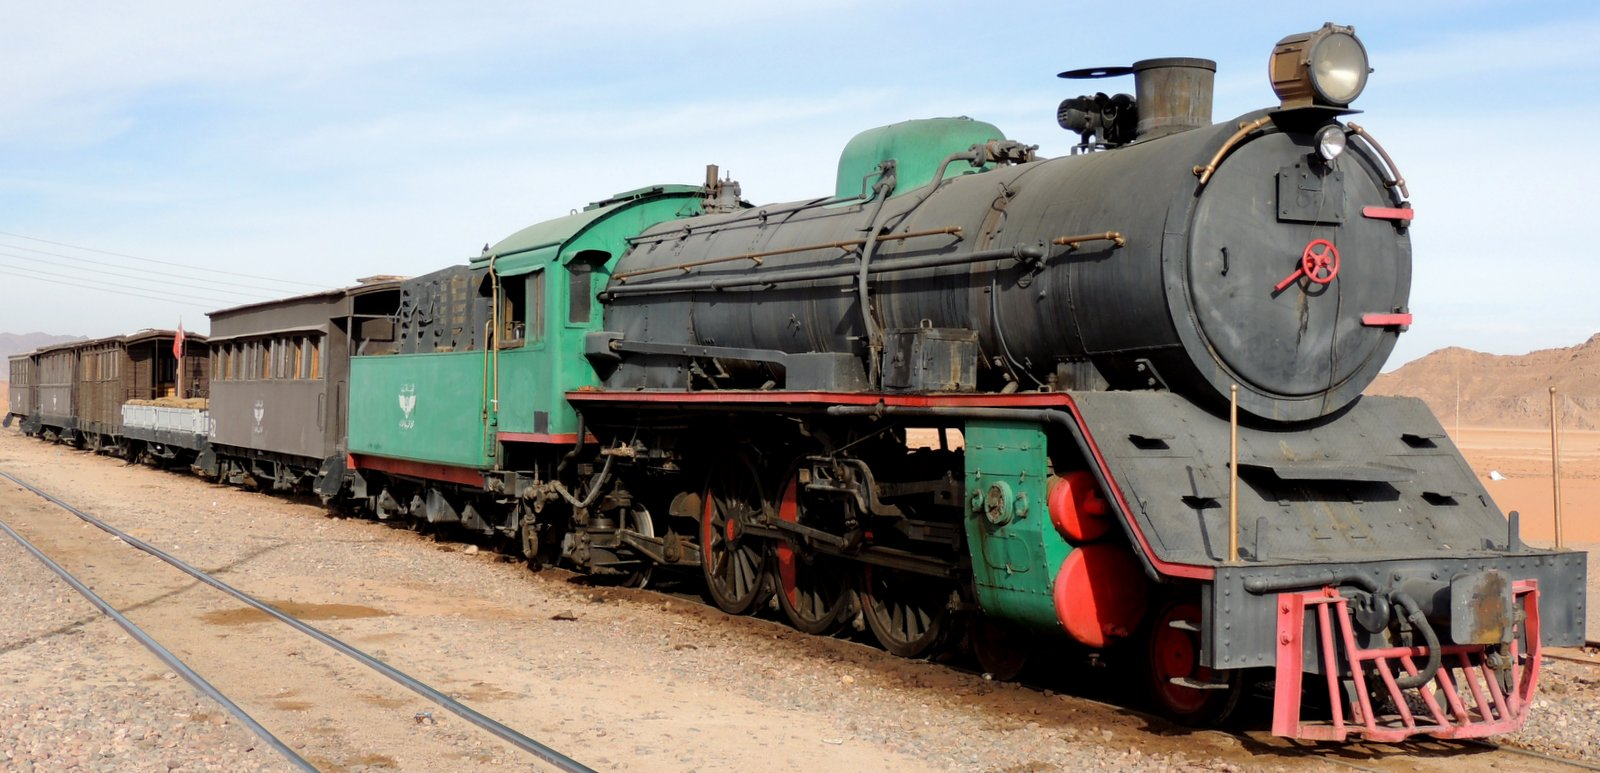 Zug der Hedschas-Bahn in Jordanien